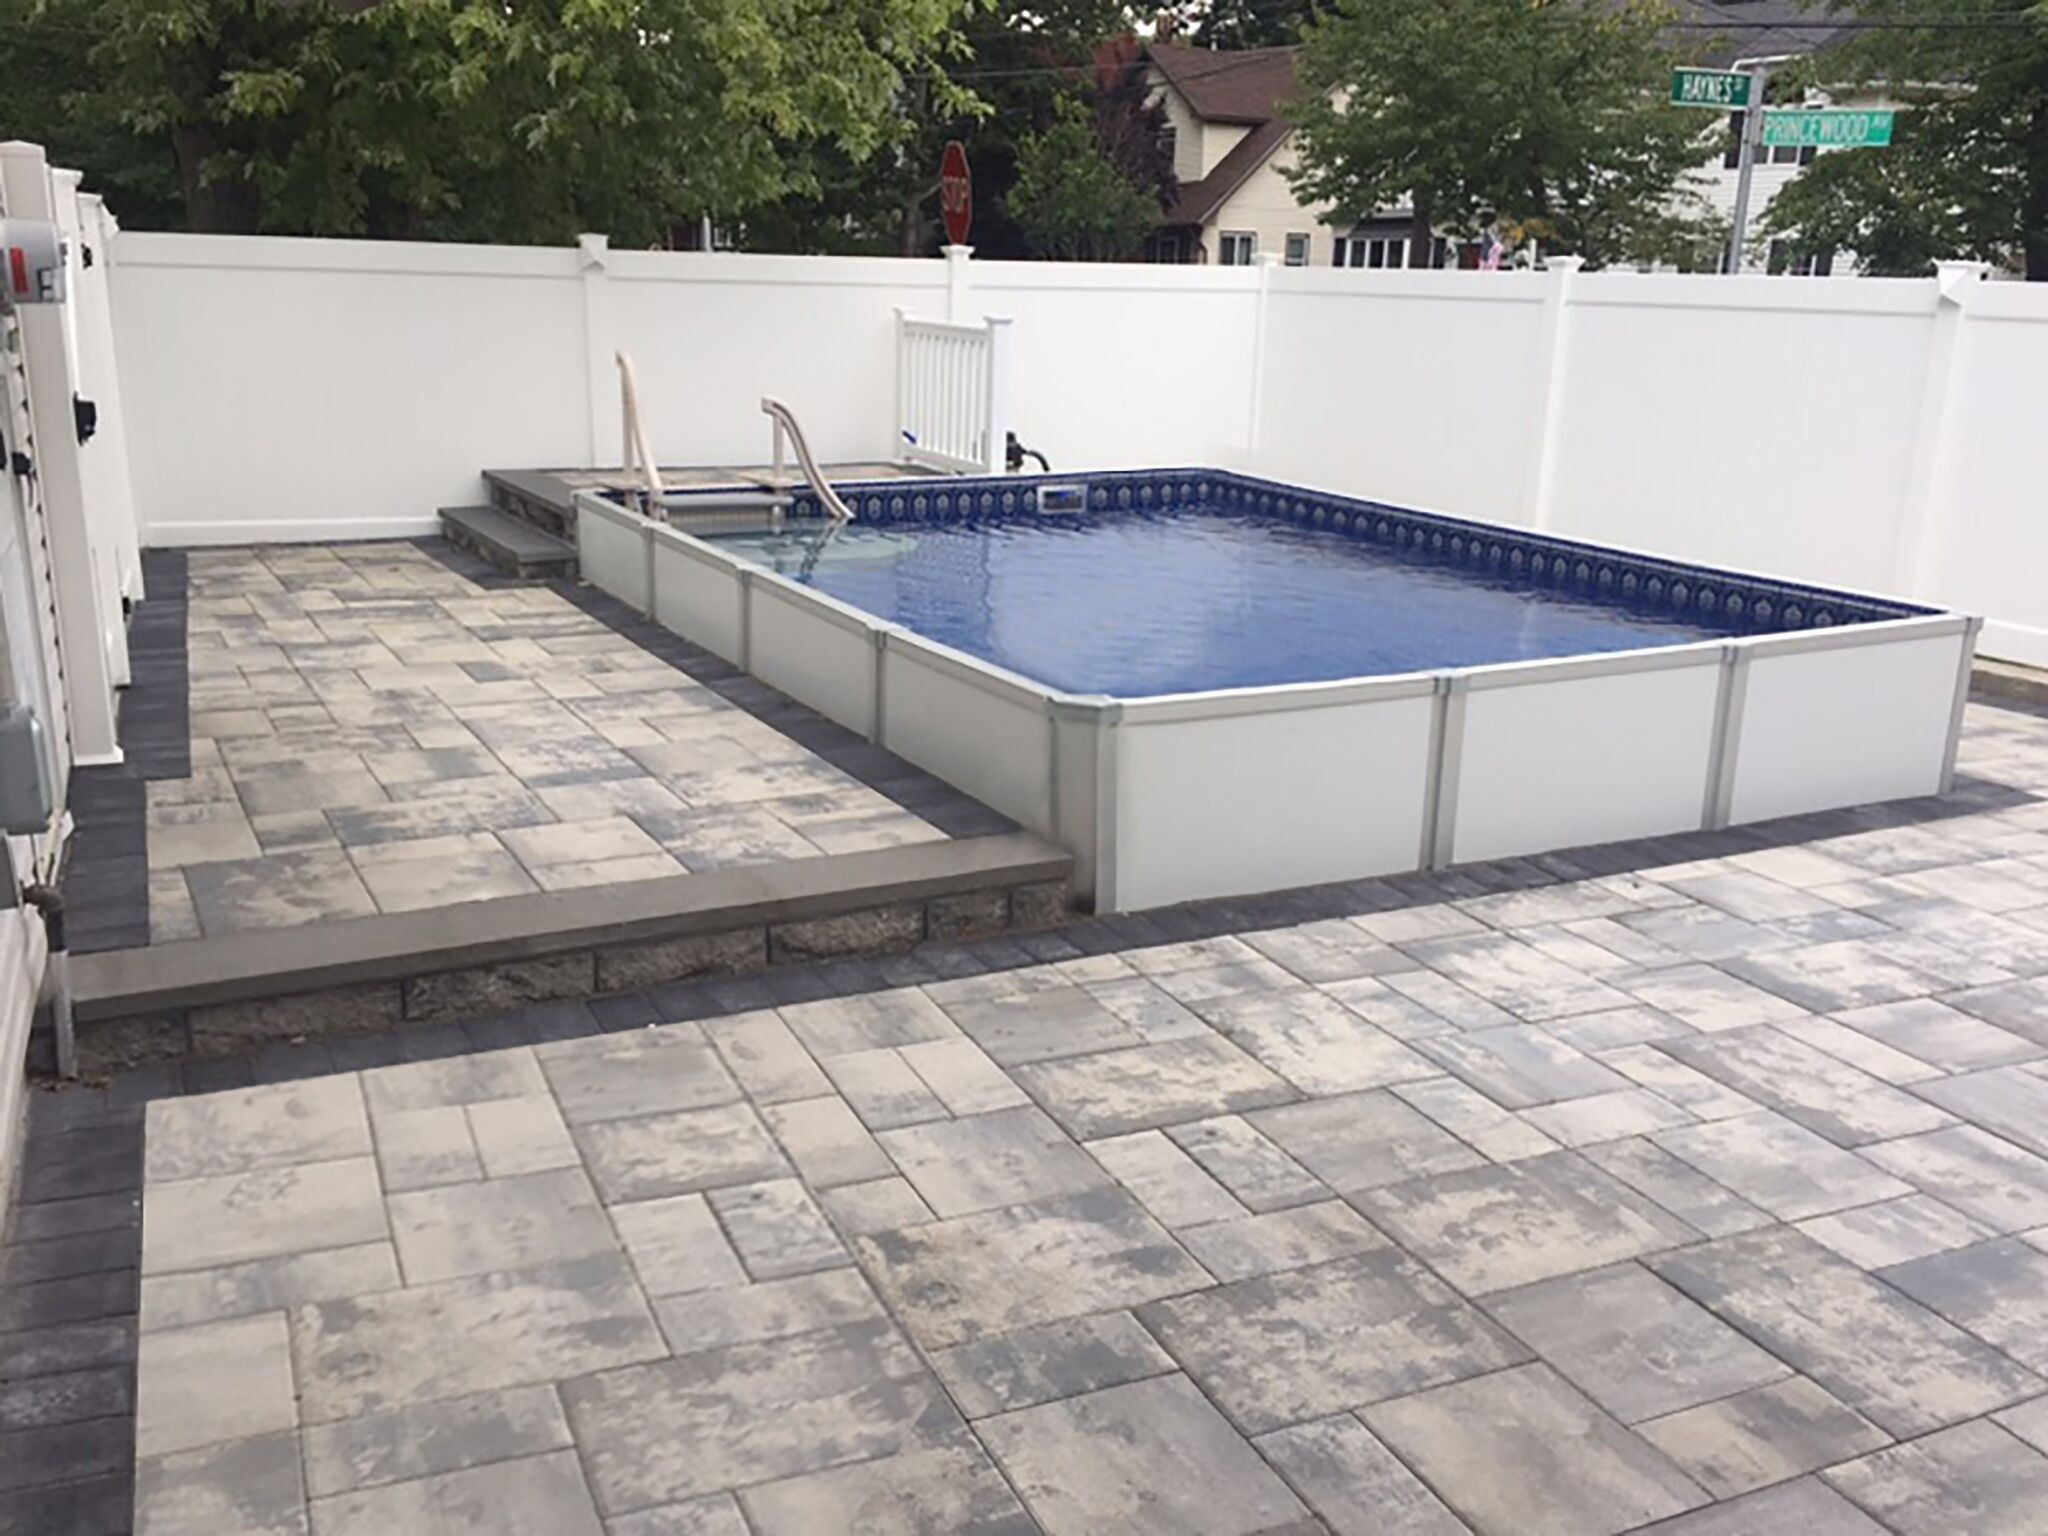 50 Gorgeous Aquascape Okc Outdoor Swimming Pool Ideas Swimming Pools Inground Rectangular Pool Above Ground Swimming Pools